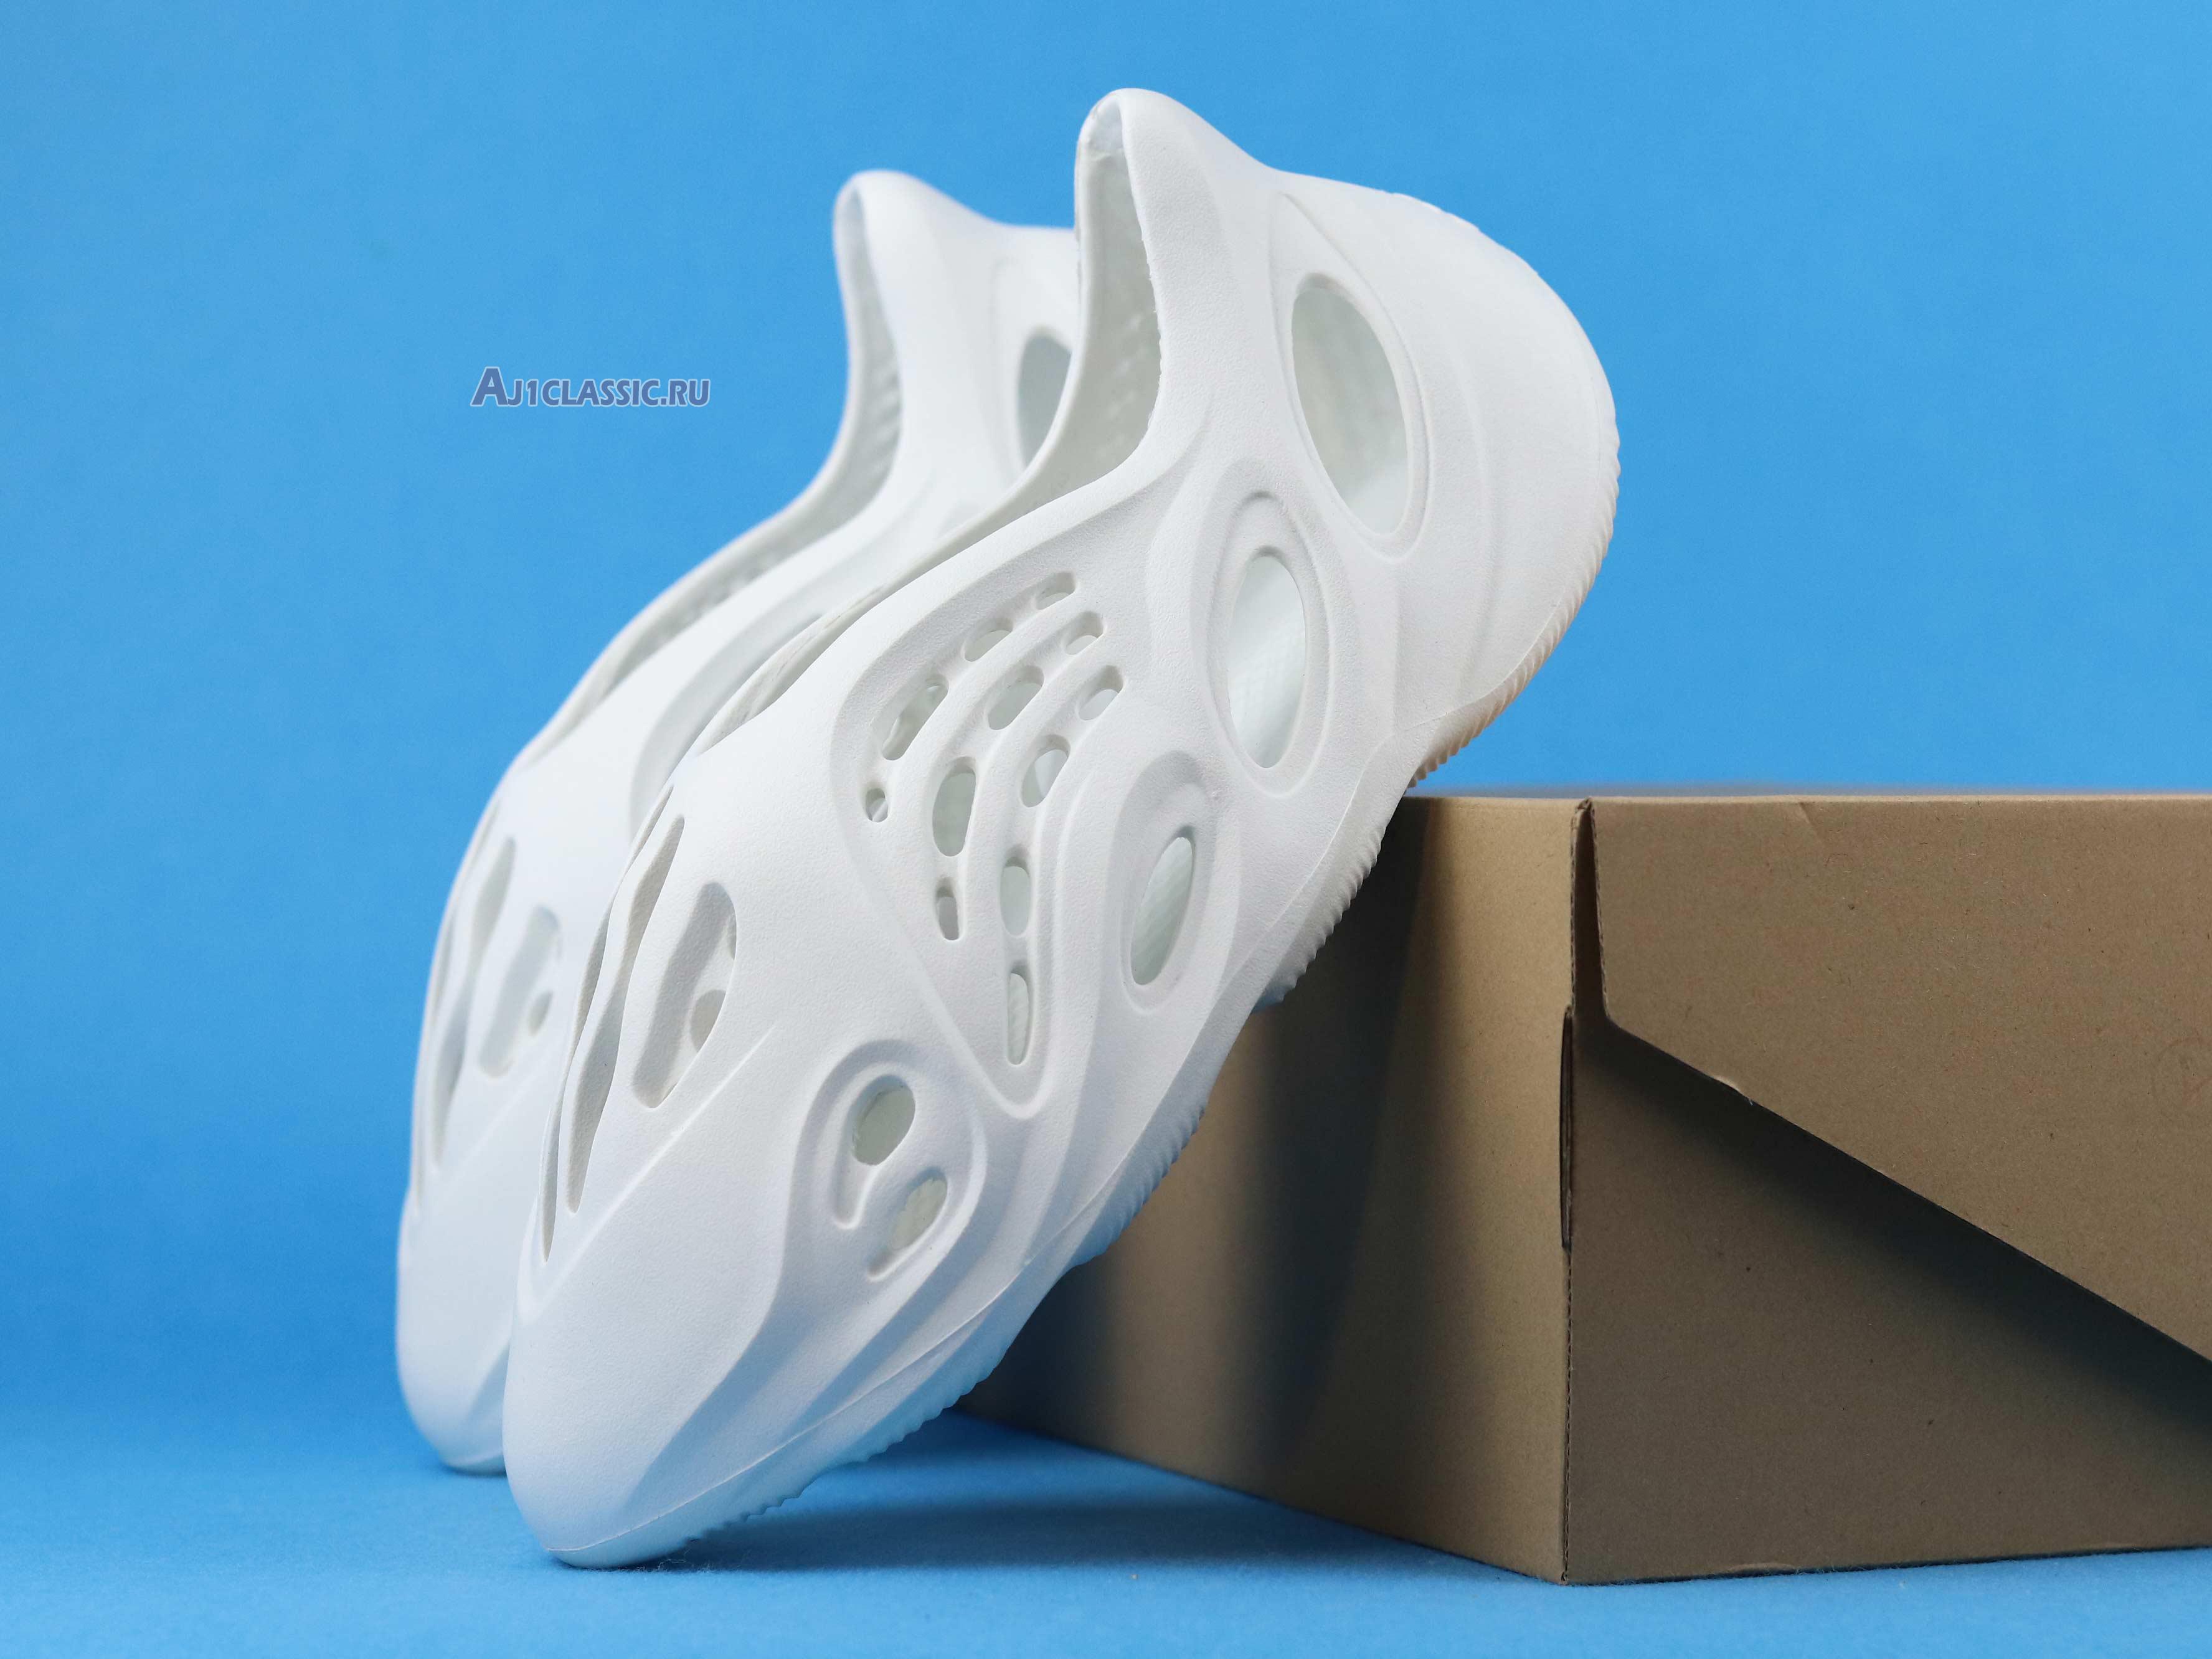 "Adidas Yeezy Foam Runner ""Ararat"" G55486"